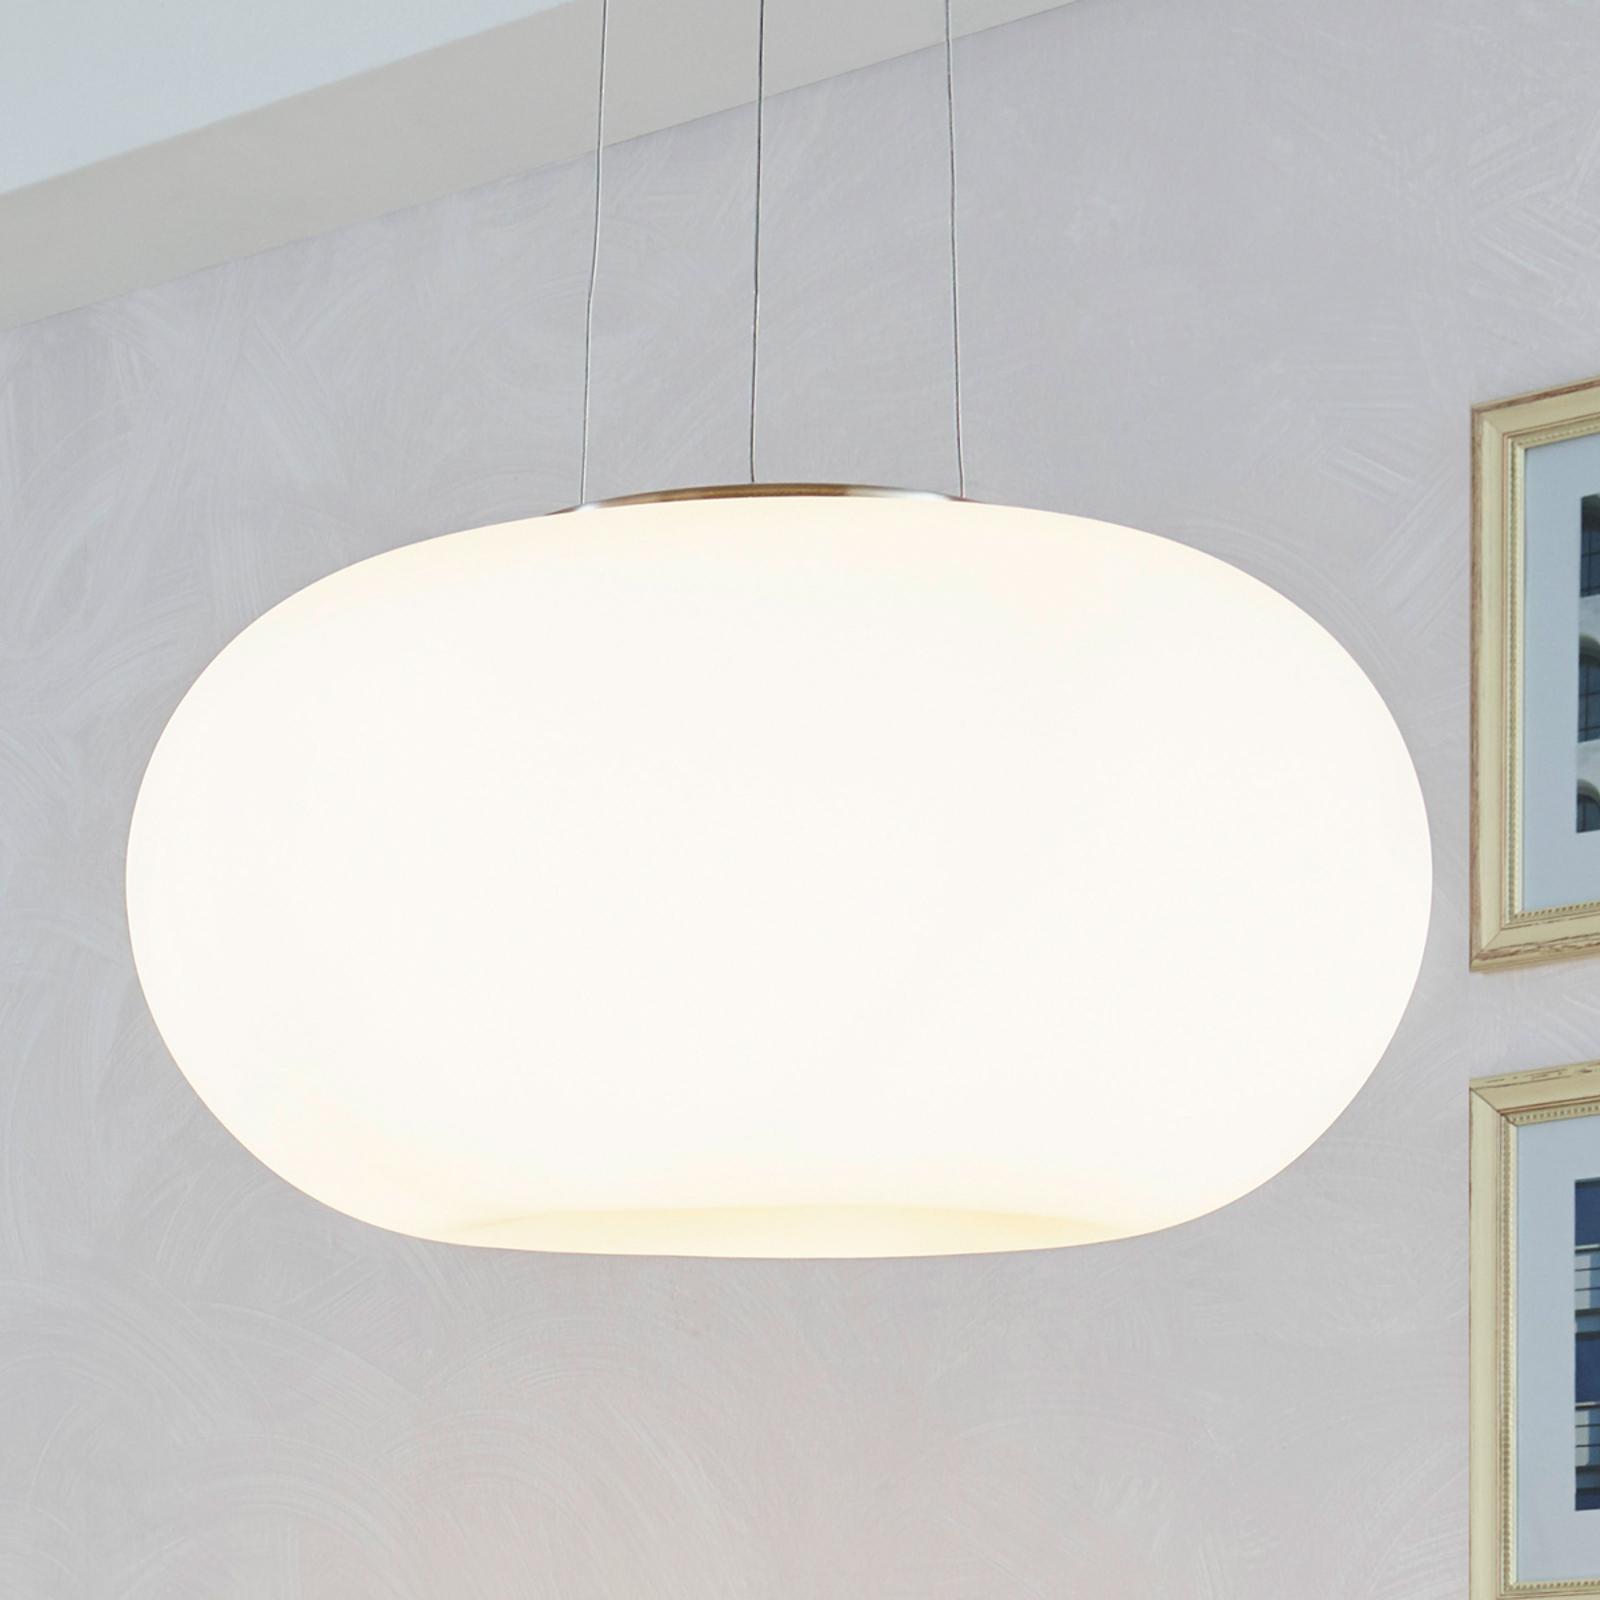 Moderne hanglamp Optica 45 cm